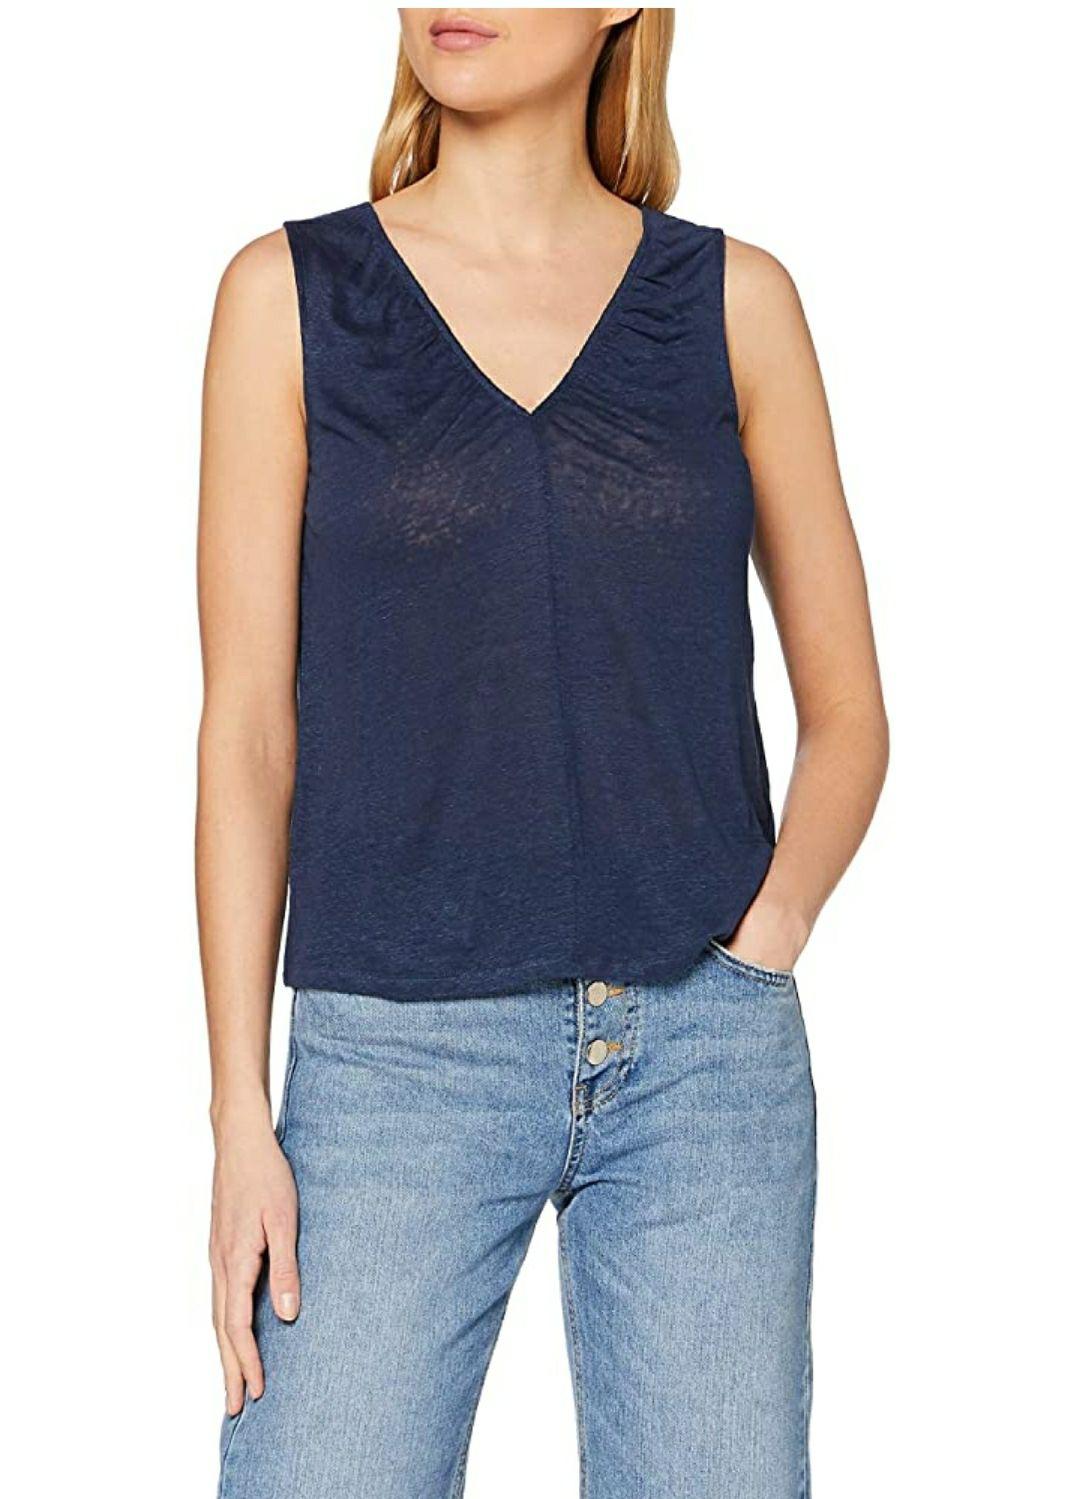 TALLA M - Mexx Camiseta sin Mangas para Mujer. Color azul